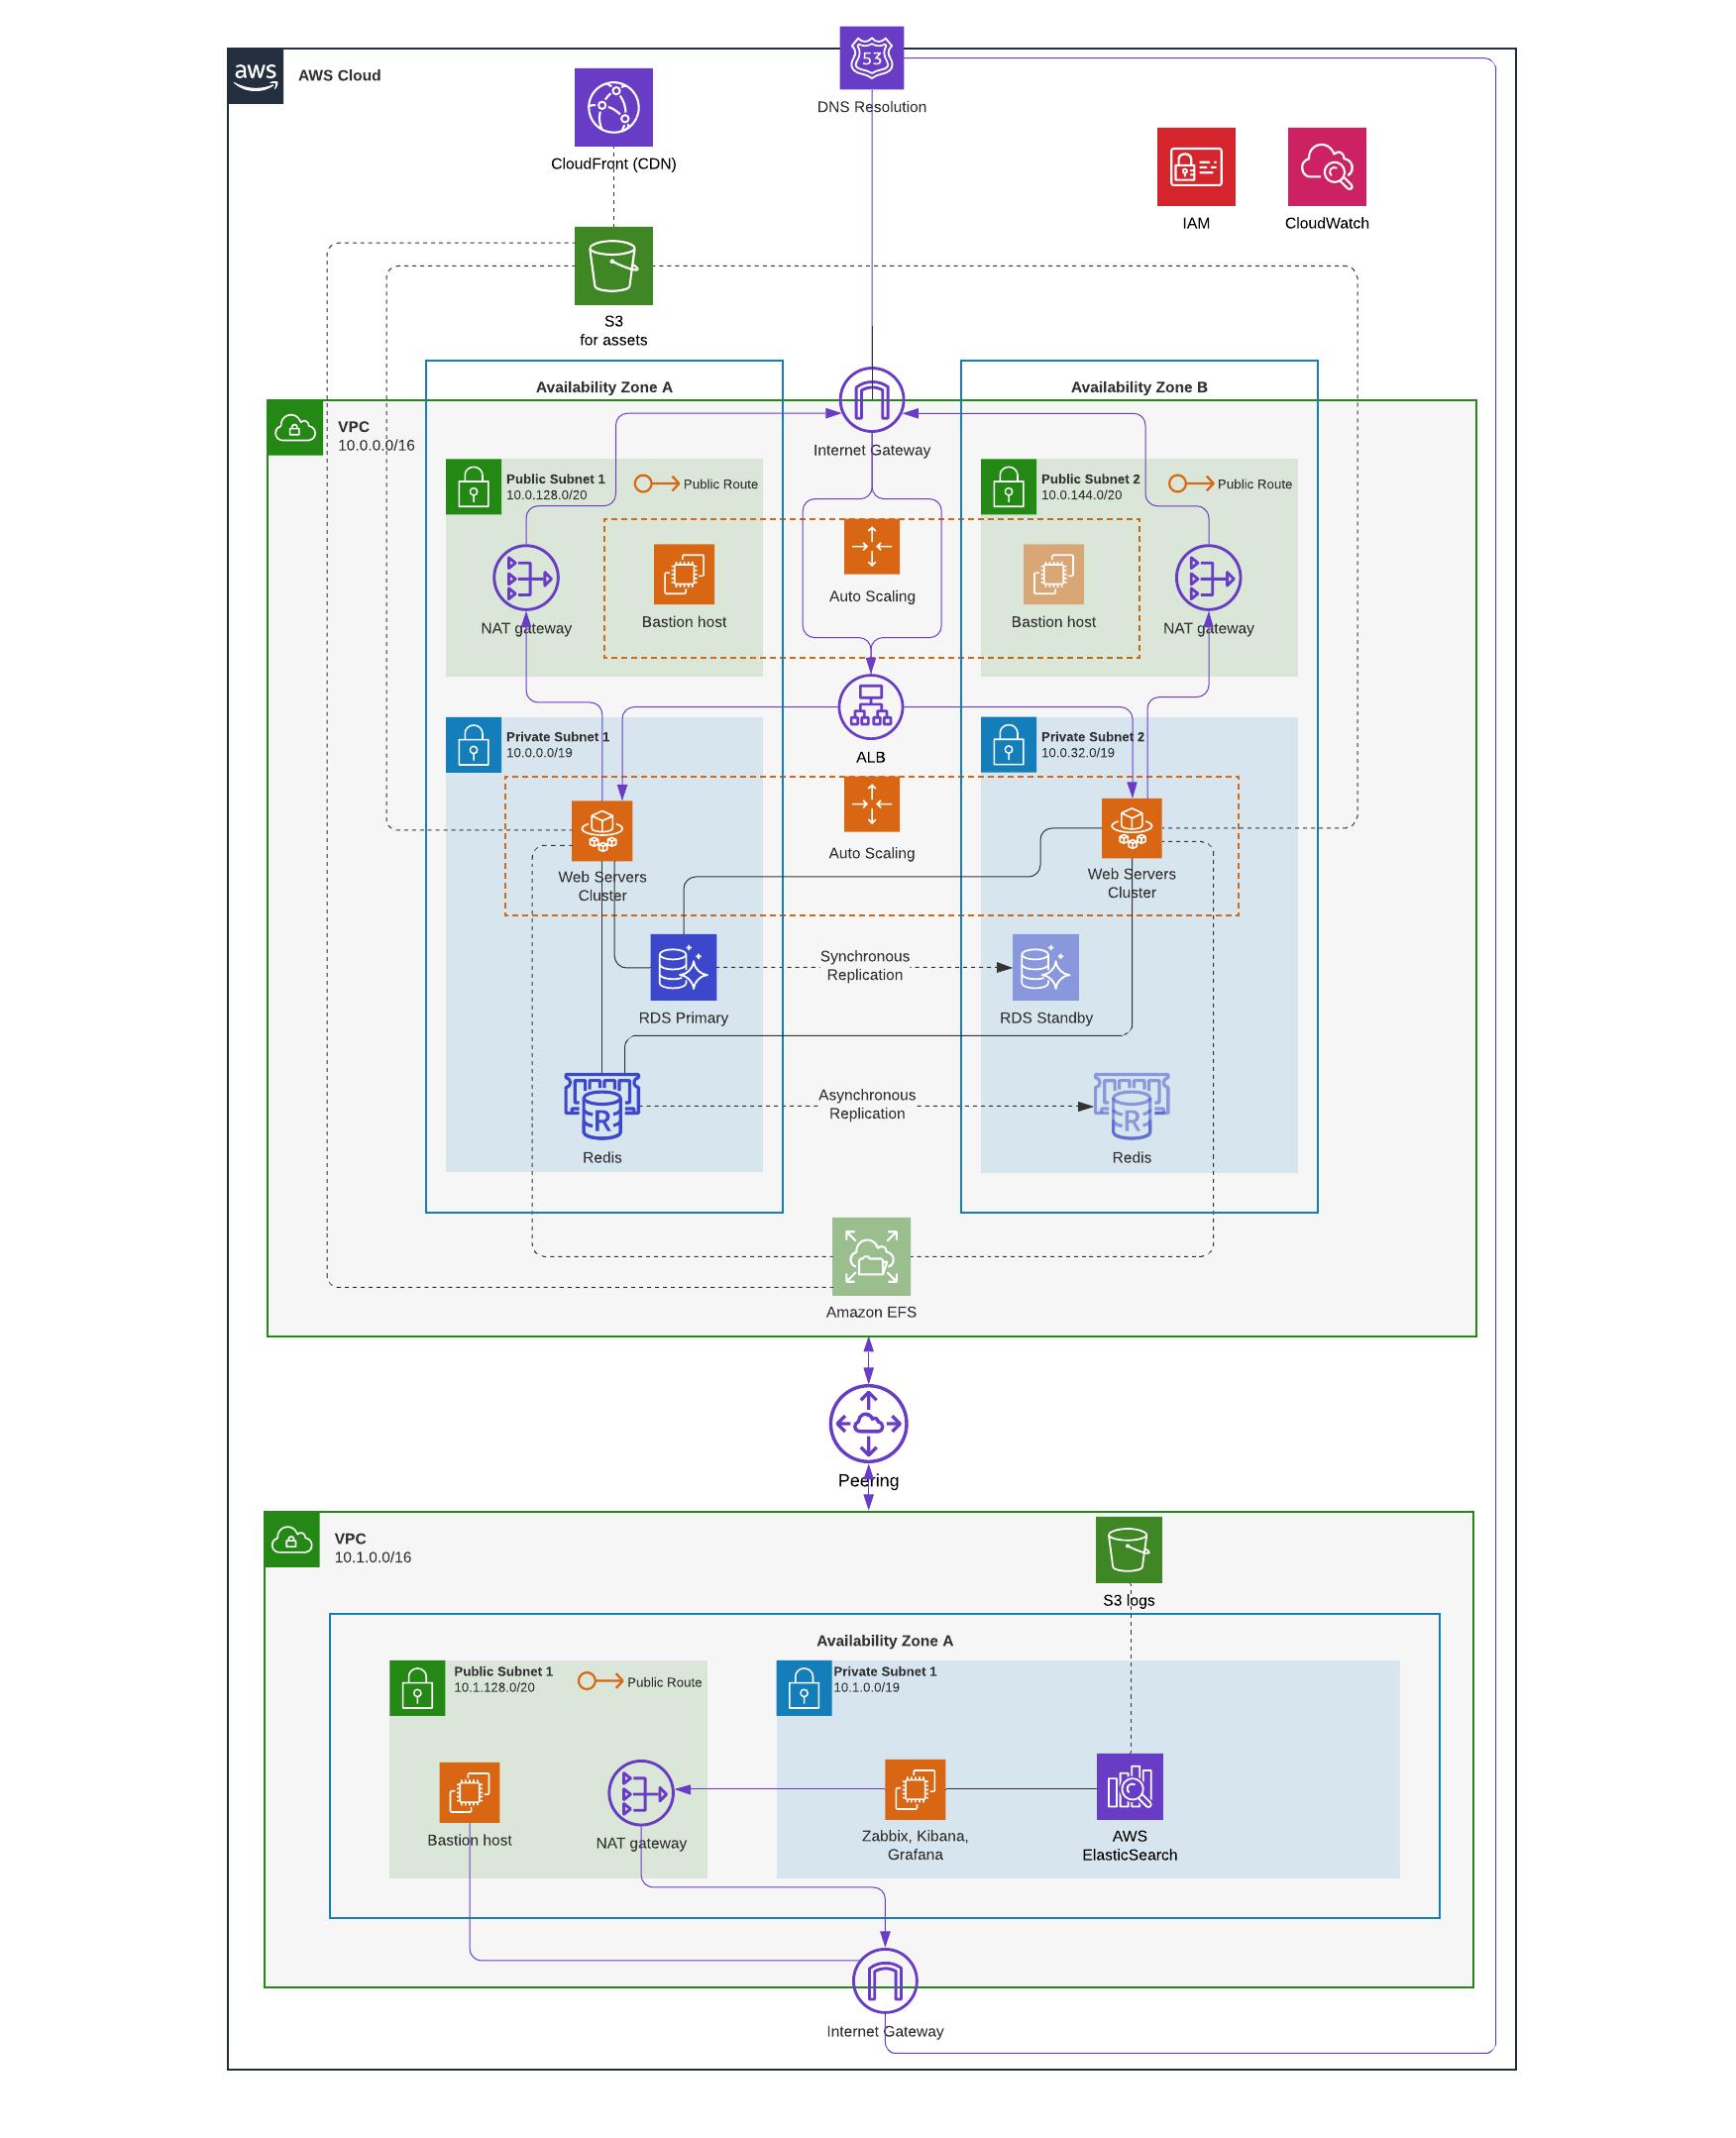 CorporateGift E-commerce Marketplace AWS Architectural Diagram - Replatforming Migration Strategy